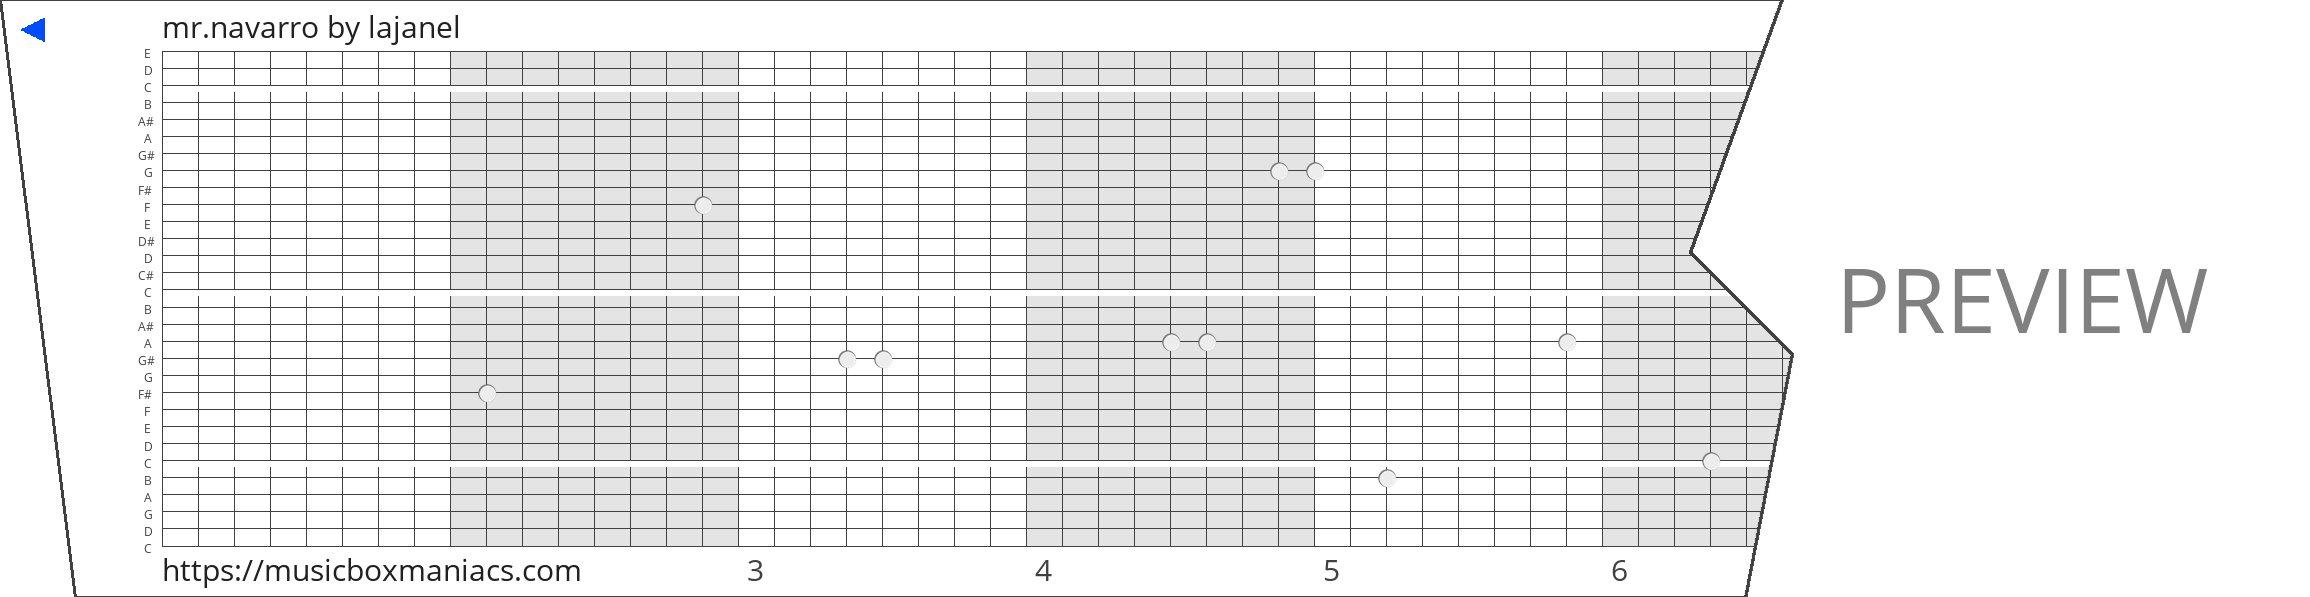 mr.navarro 30 note music box paper strip